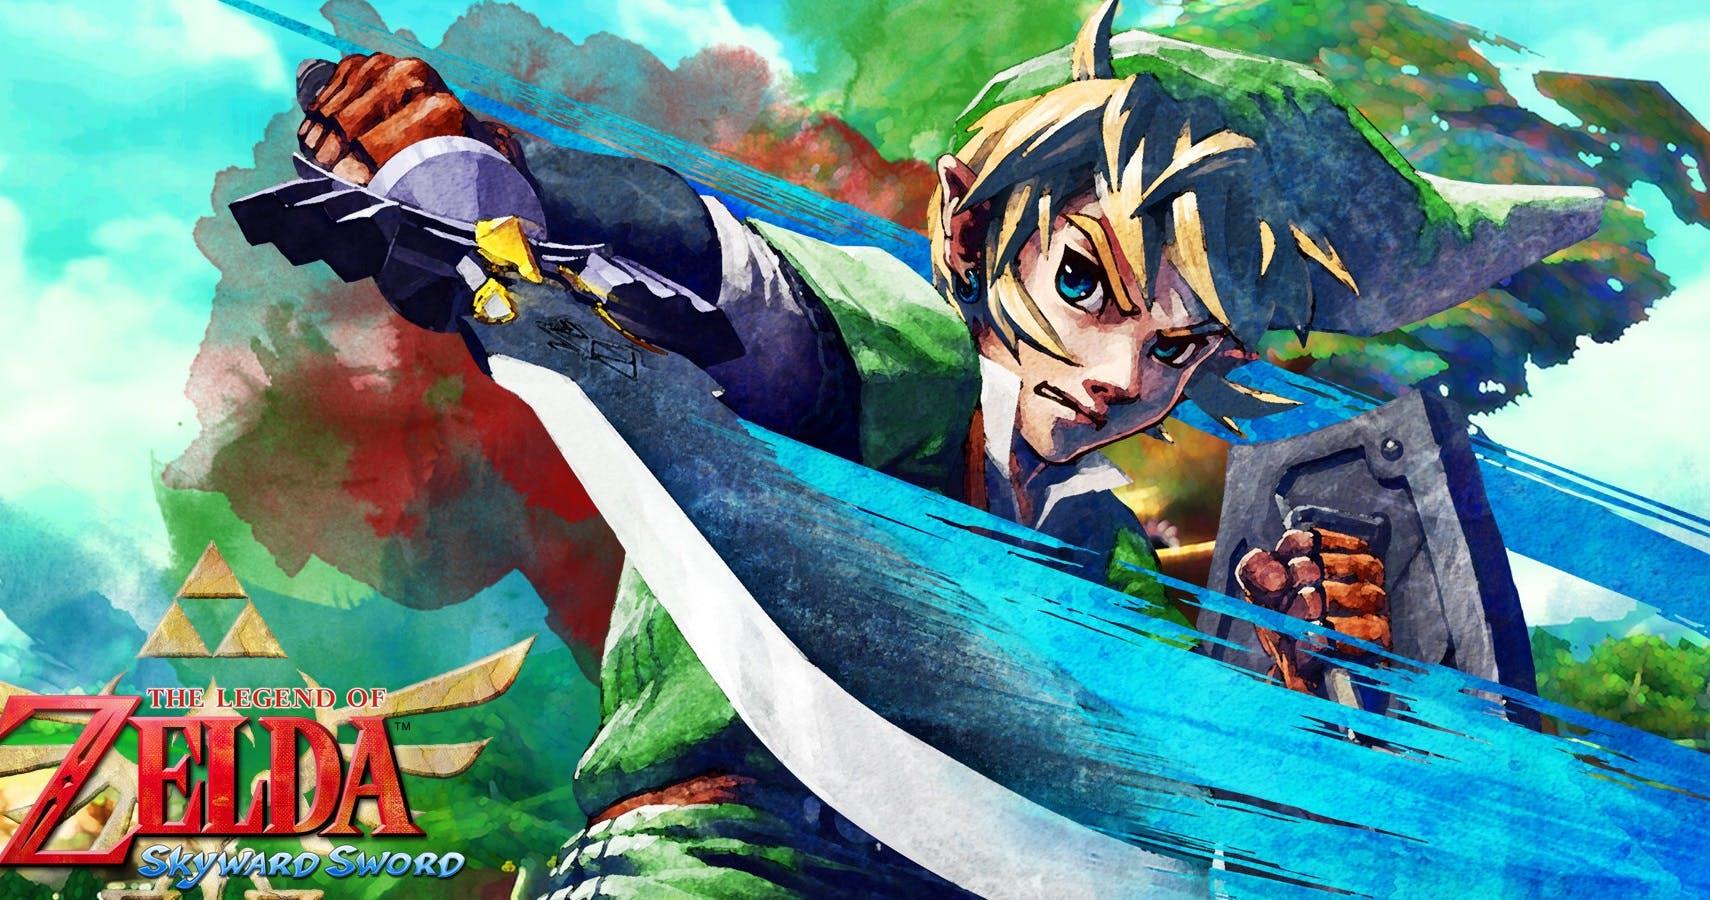 Ten years later, I still love The Legend of Zelda: Skyward Sword  screenshot